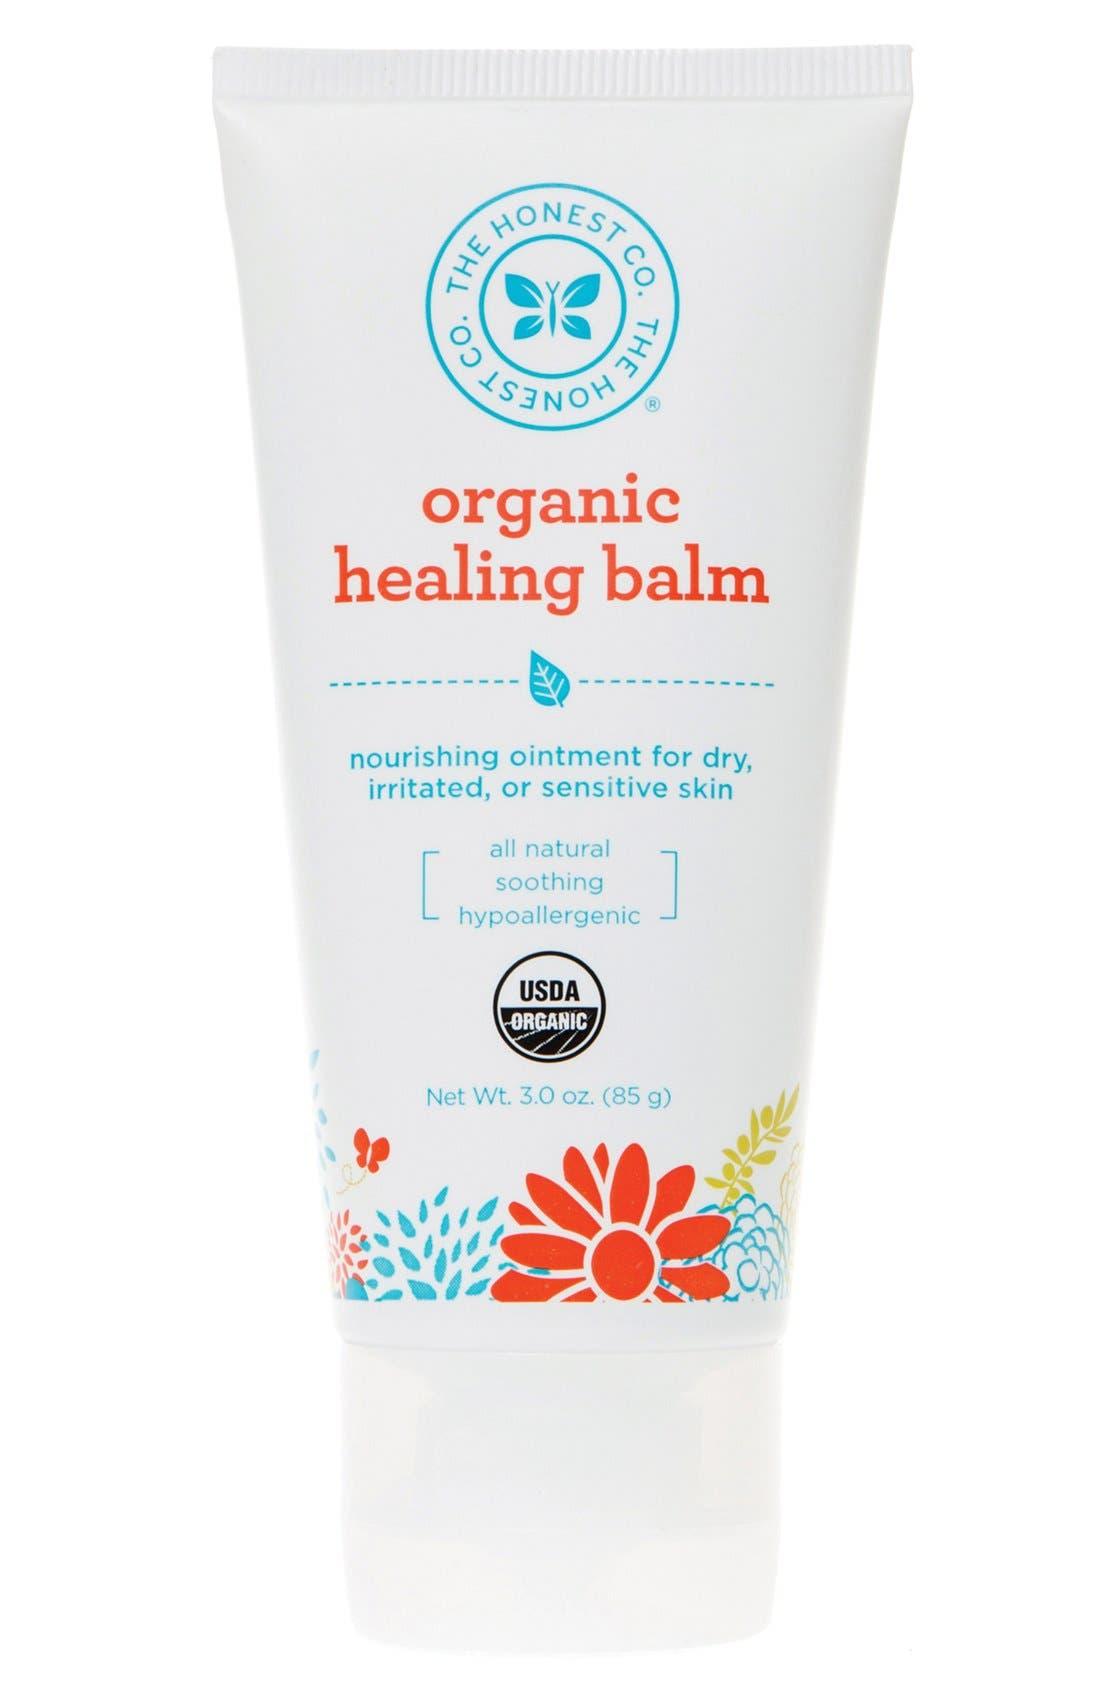 The Honest Company Organic Healing Balm